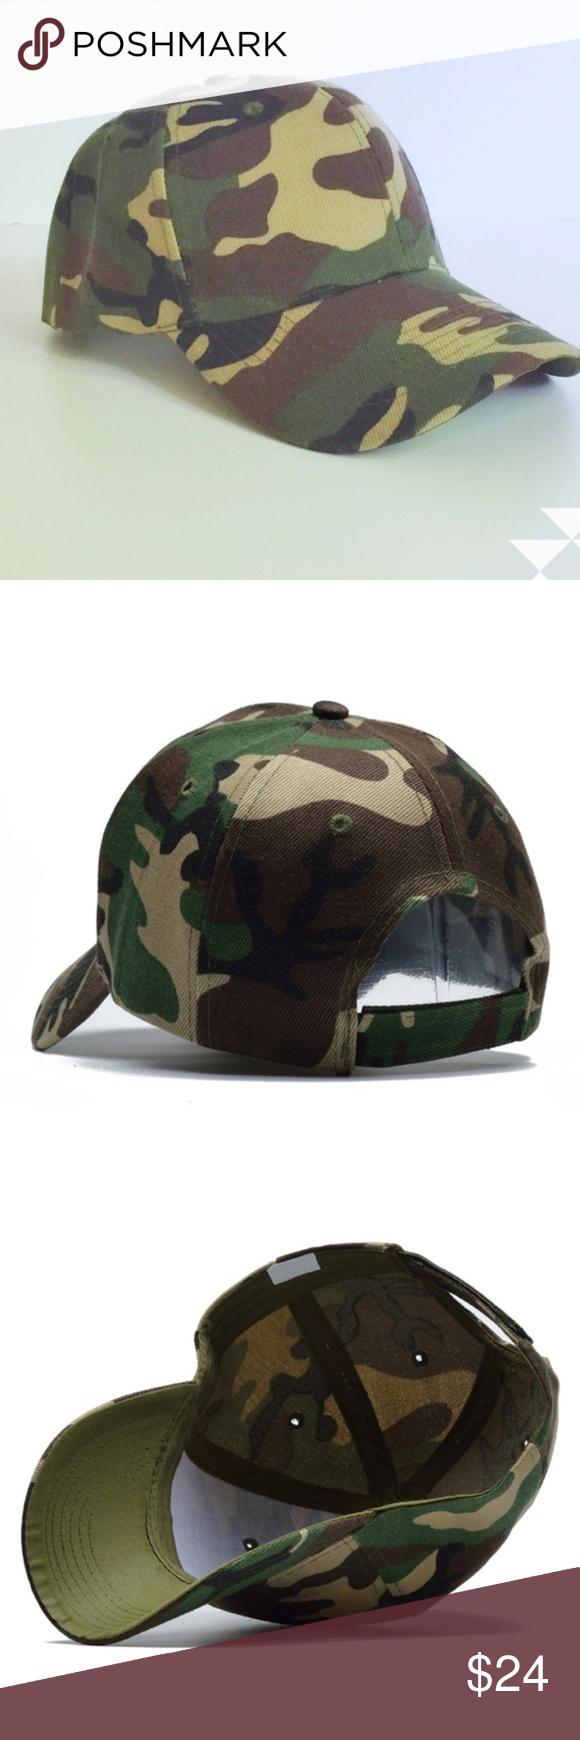 Camo Baseball Hat Cap Adjustable Unisex New Women Accessories Hats Camo Baseball Hat Unisex